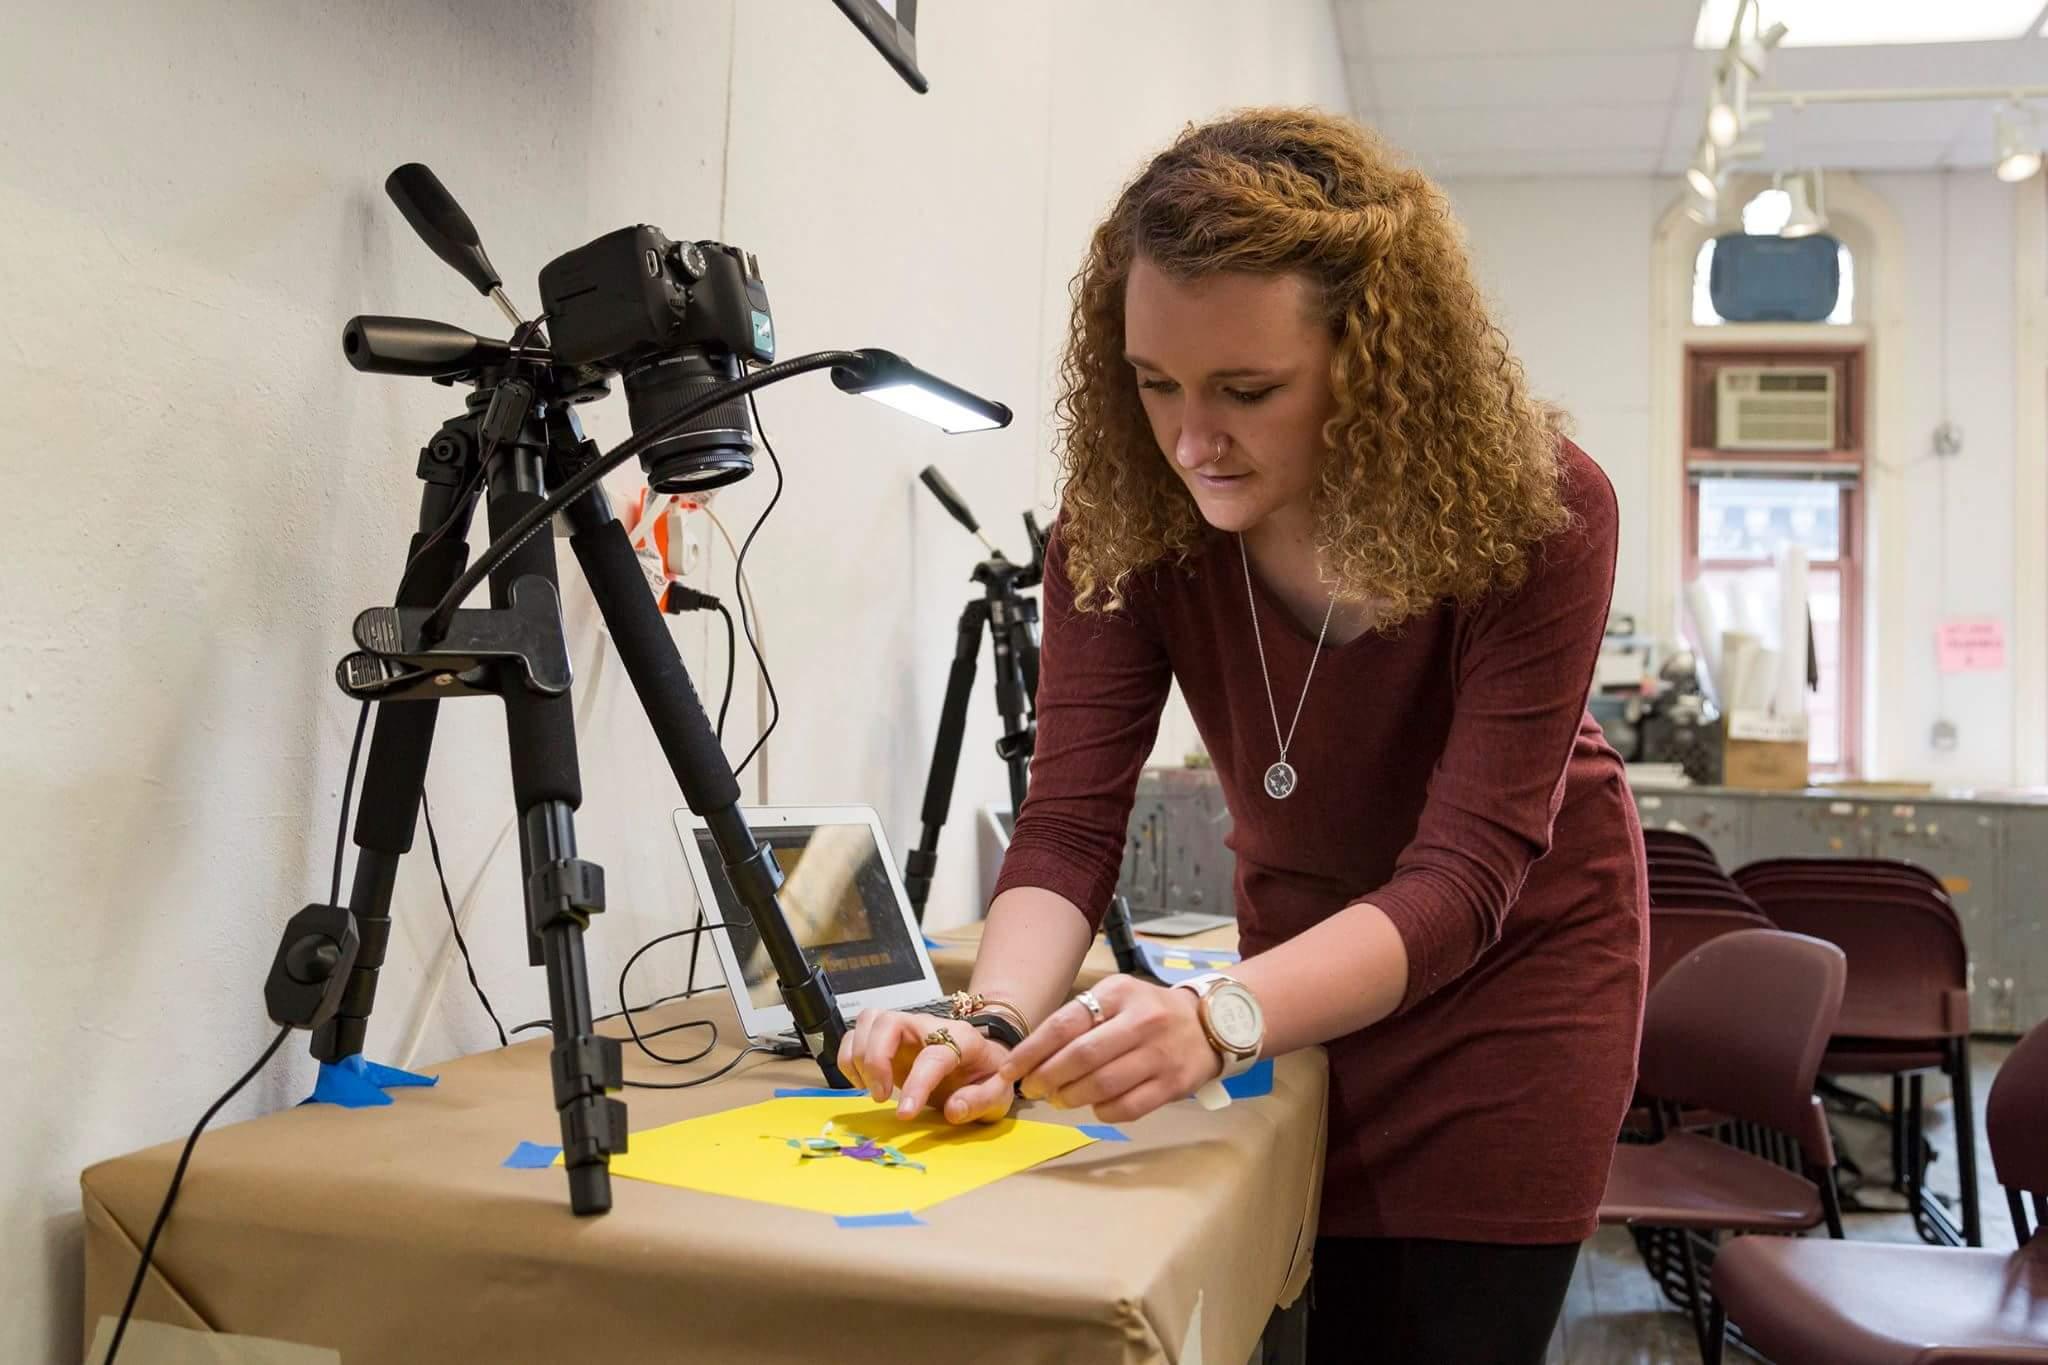 Head of Programs: Siobhan Cavanagh